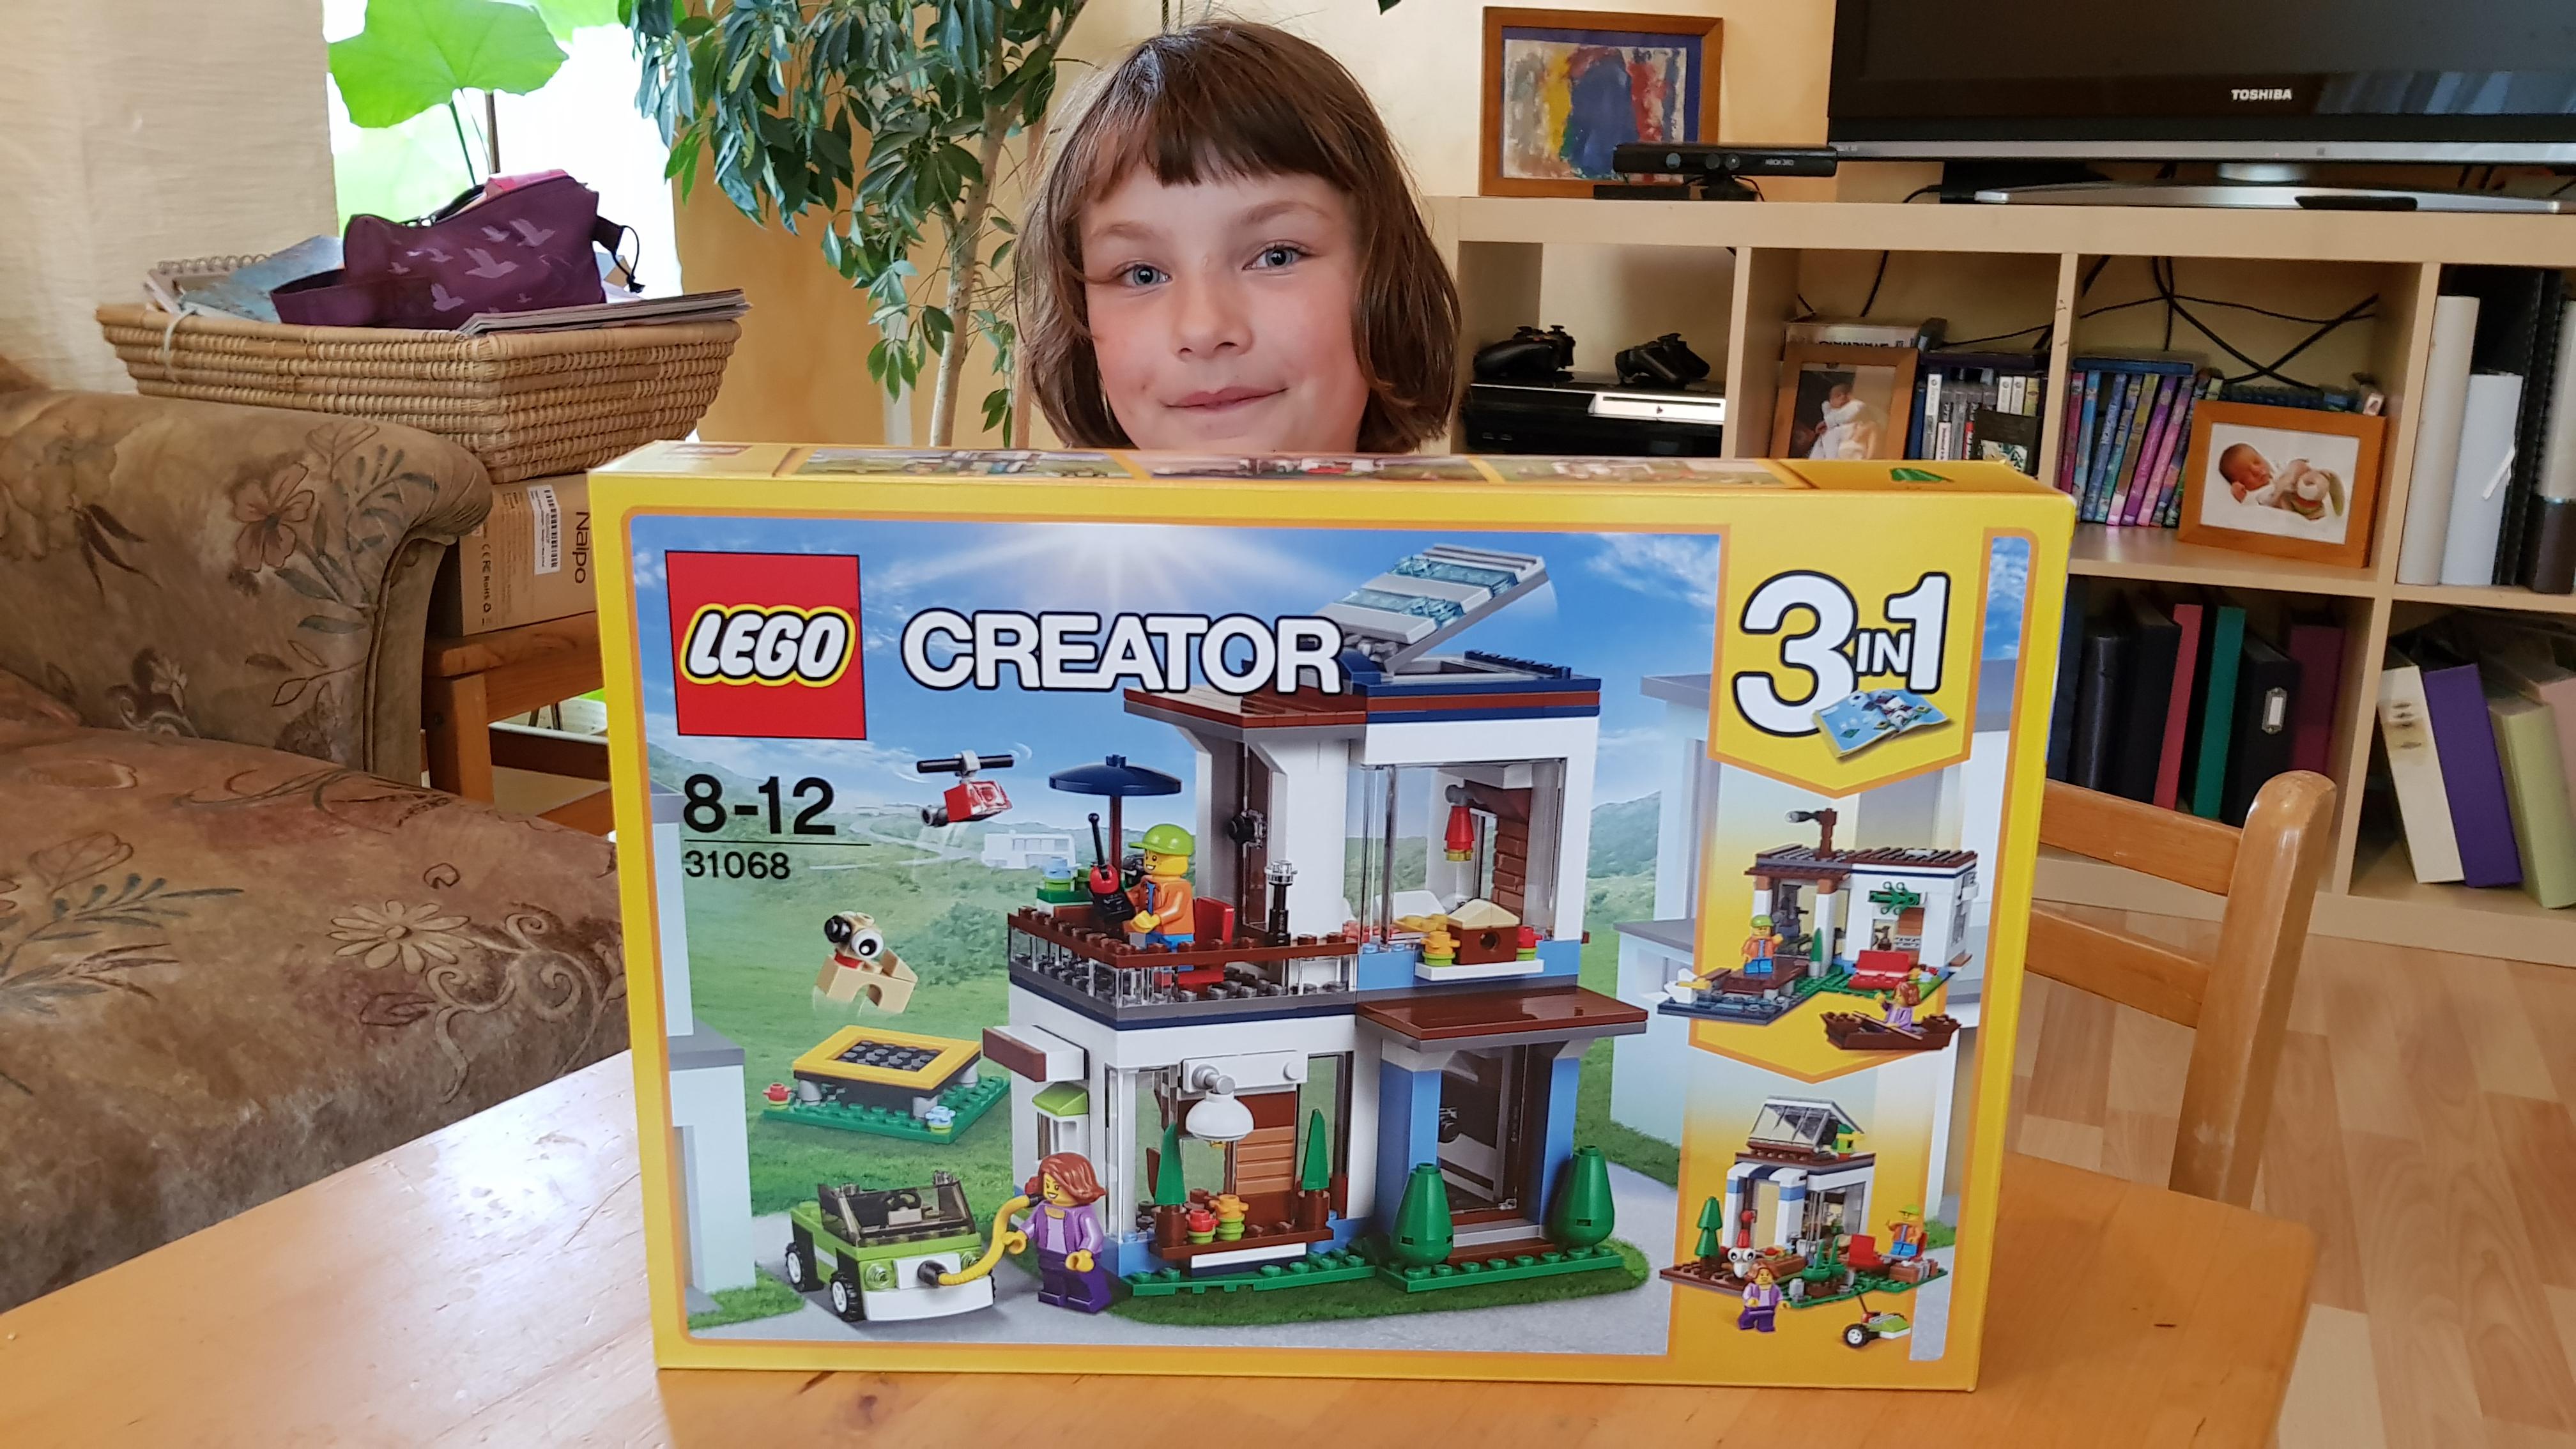 LEGO 31068 Creator: Modernes Zuhause - meinspielzeug24.de